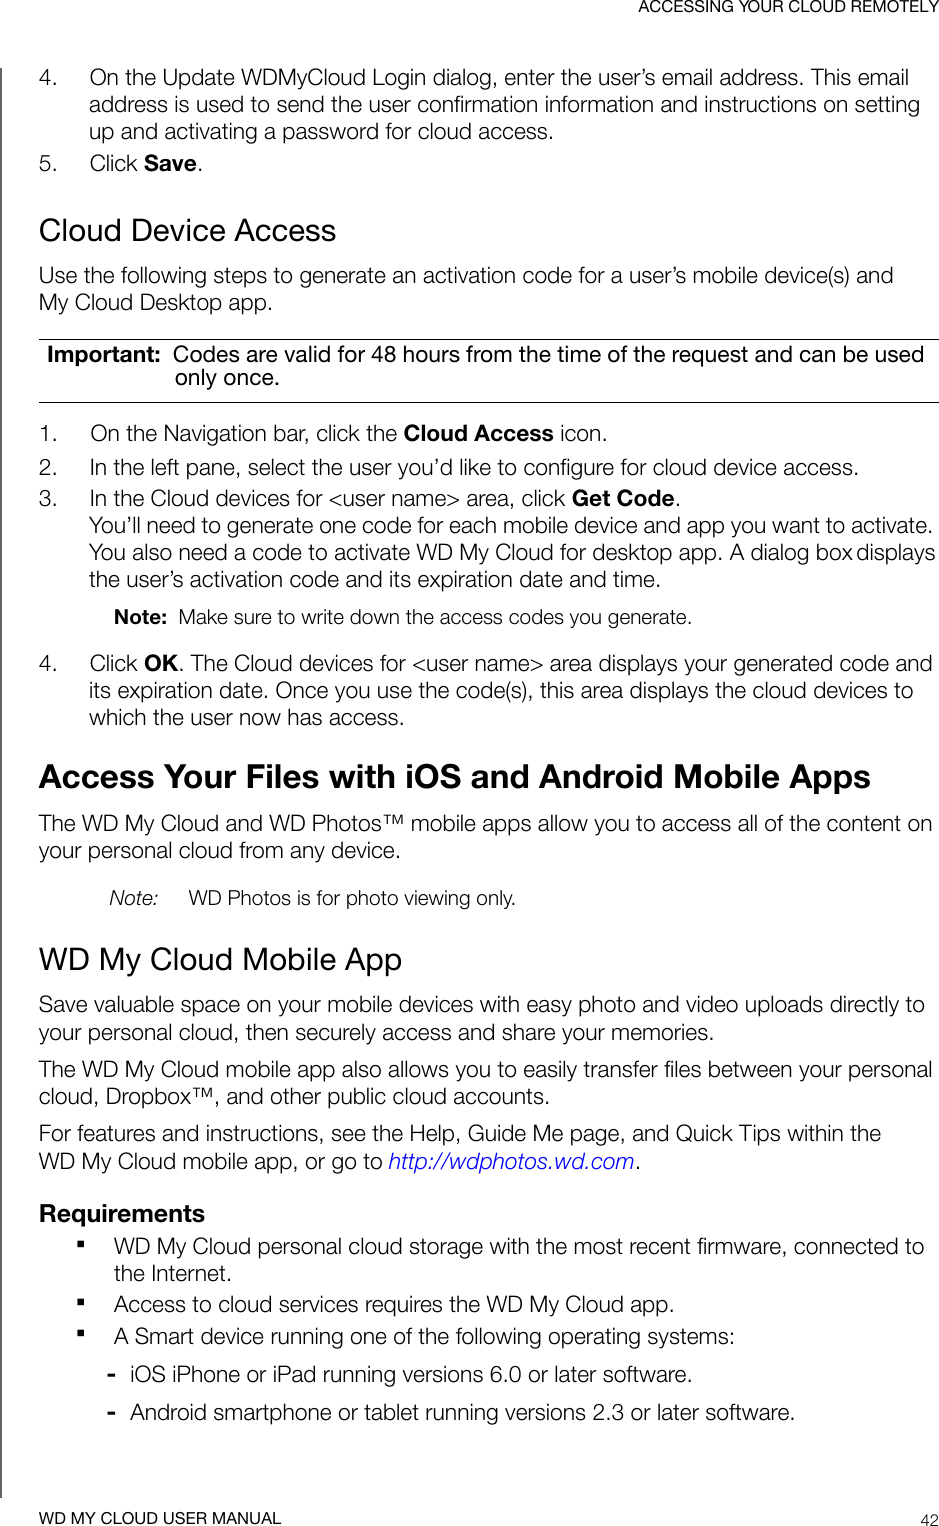 Western Digital My Cloud Ex4100 Users Manual CloudMirror Personal